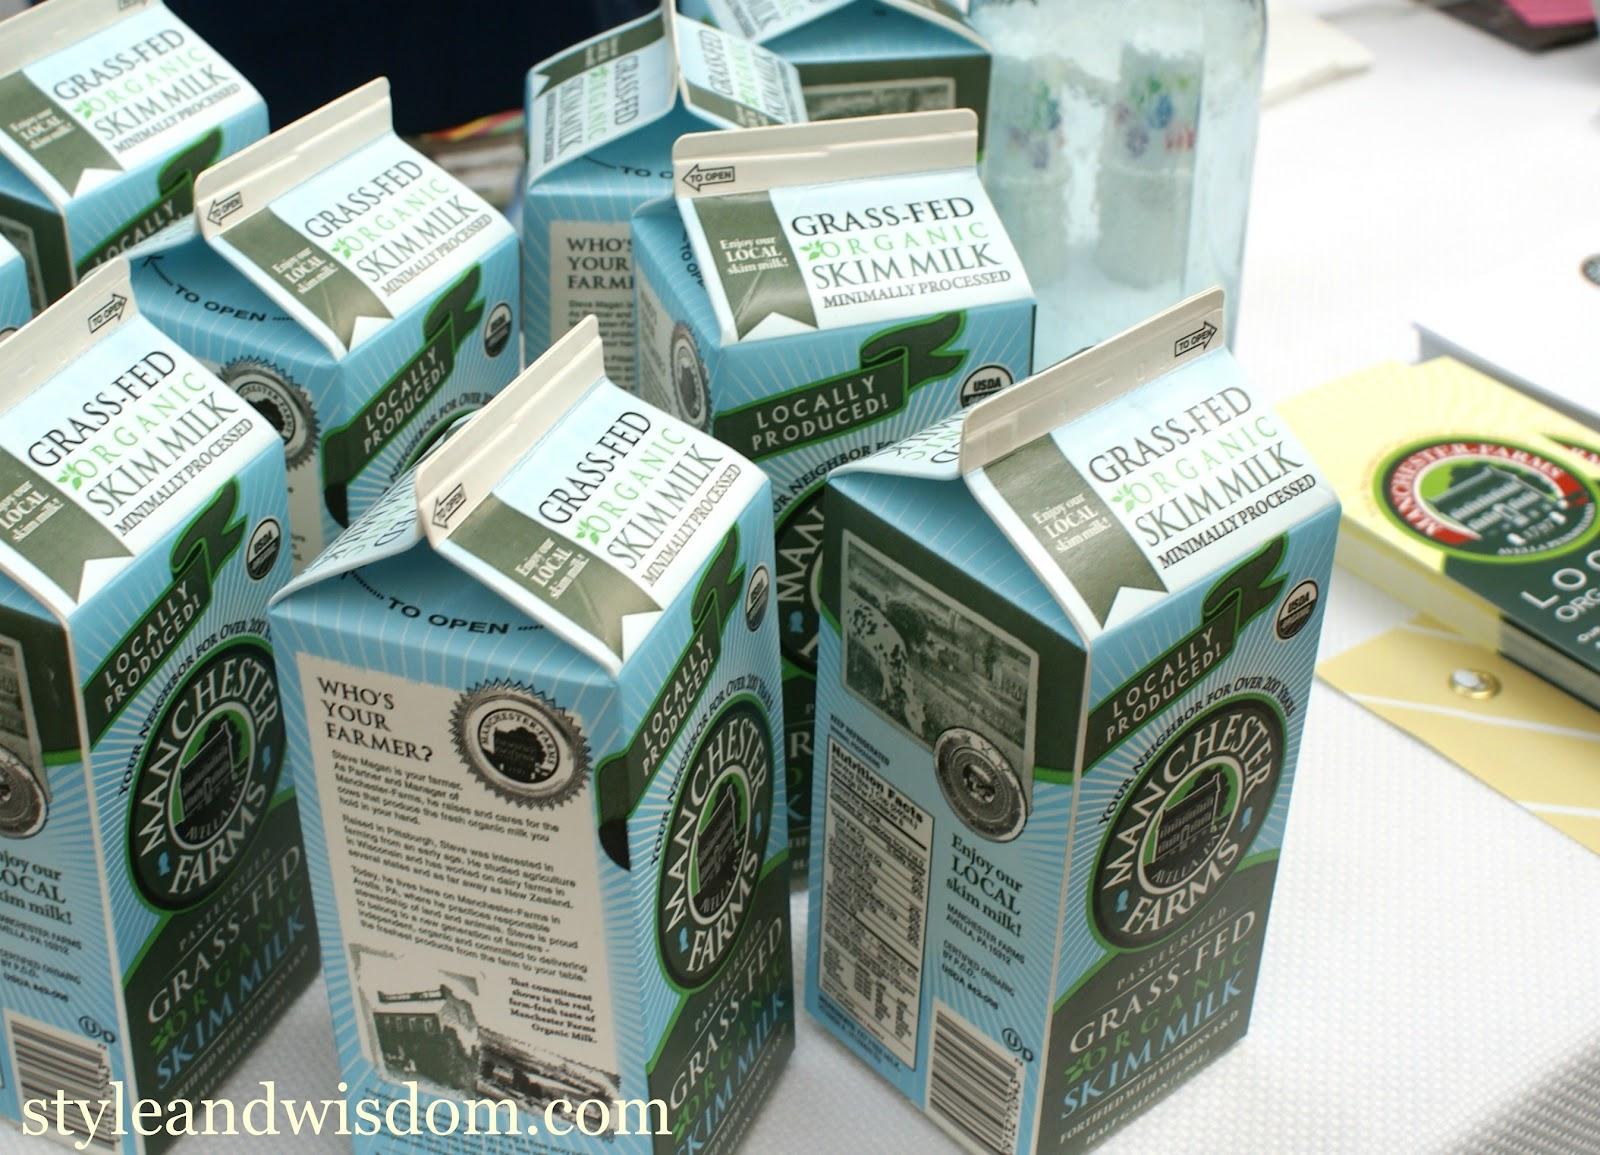 http://3.bp.blogspot.com/-gR8ba026vzM/T24KrdkppjI/AAAAAAAABfU/uRvkUAVdZaw/s1600/Farm+To+Table+3.jpg